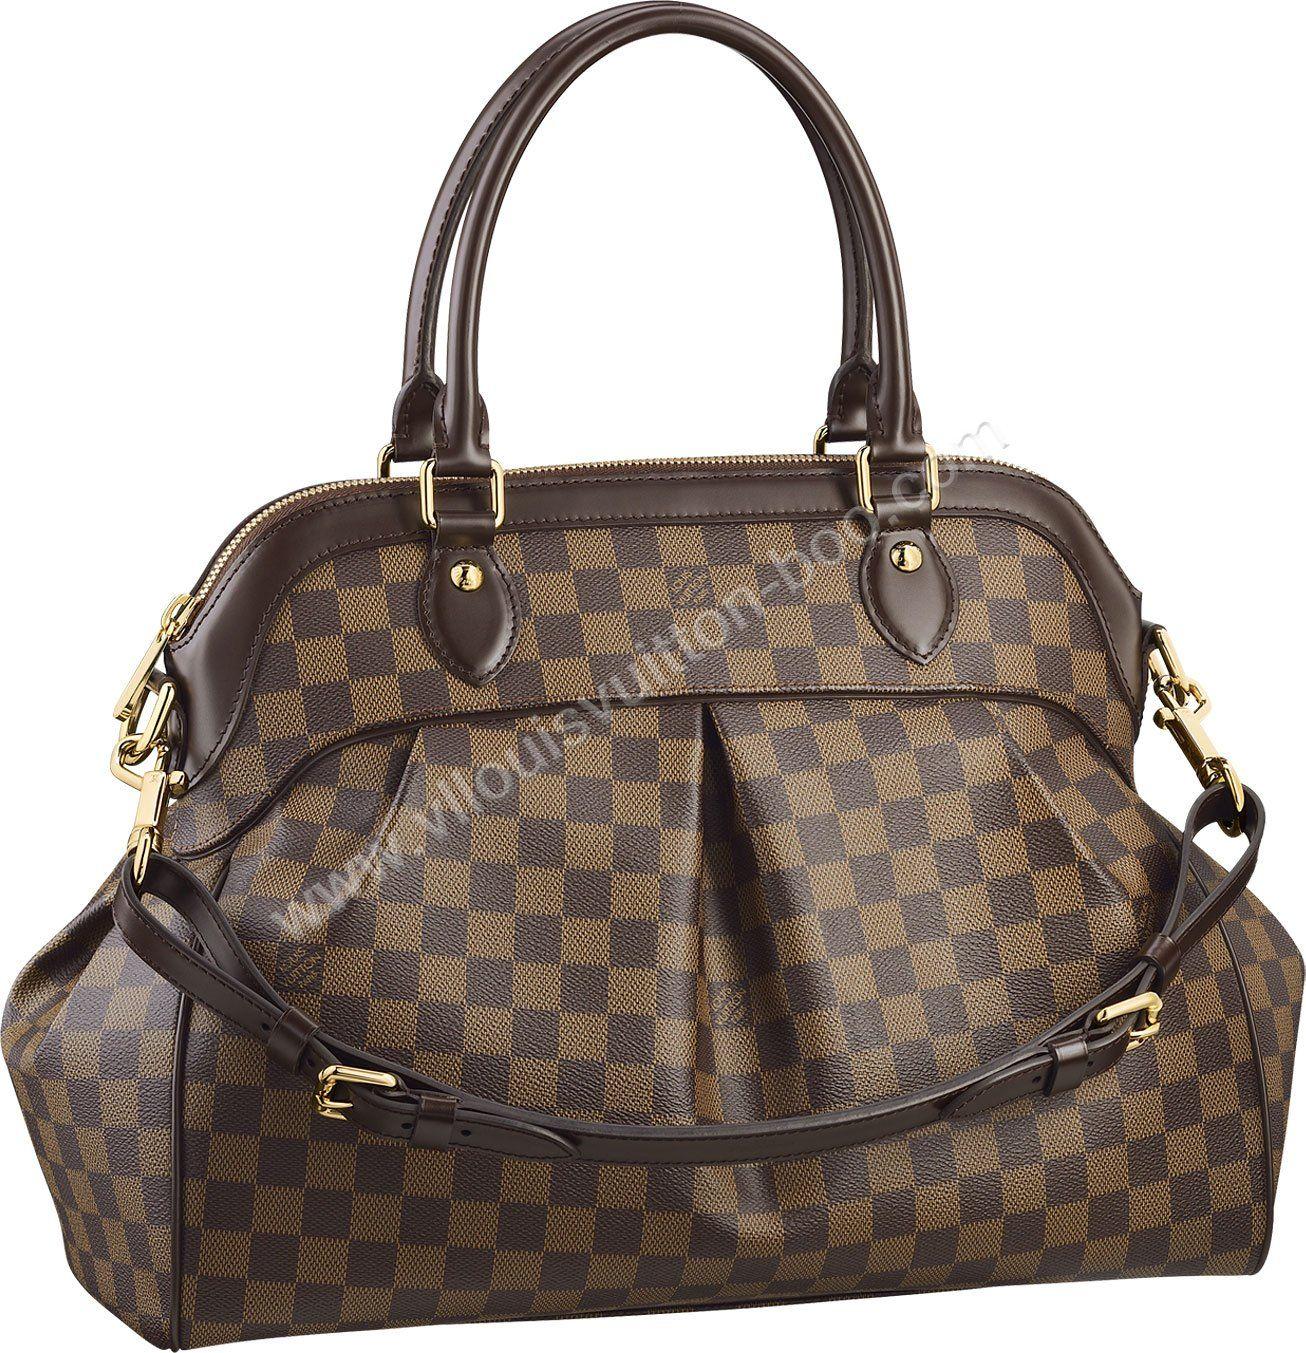 6583097cfe92 handbag factory louis vitton